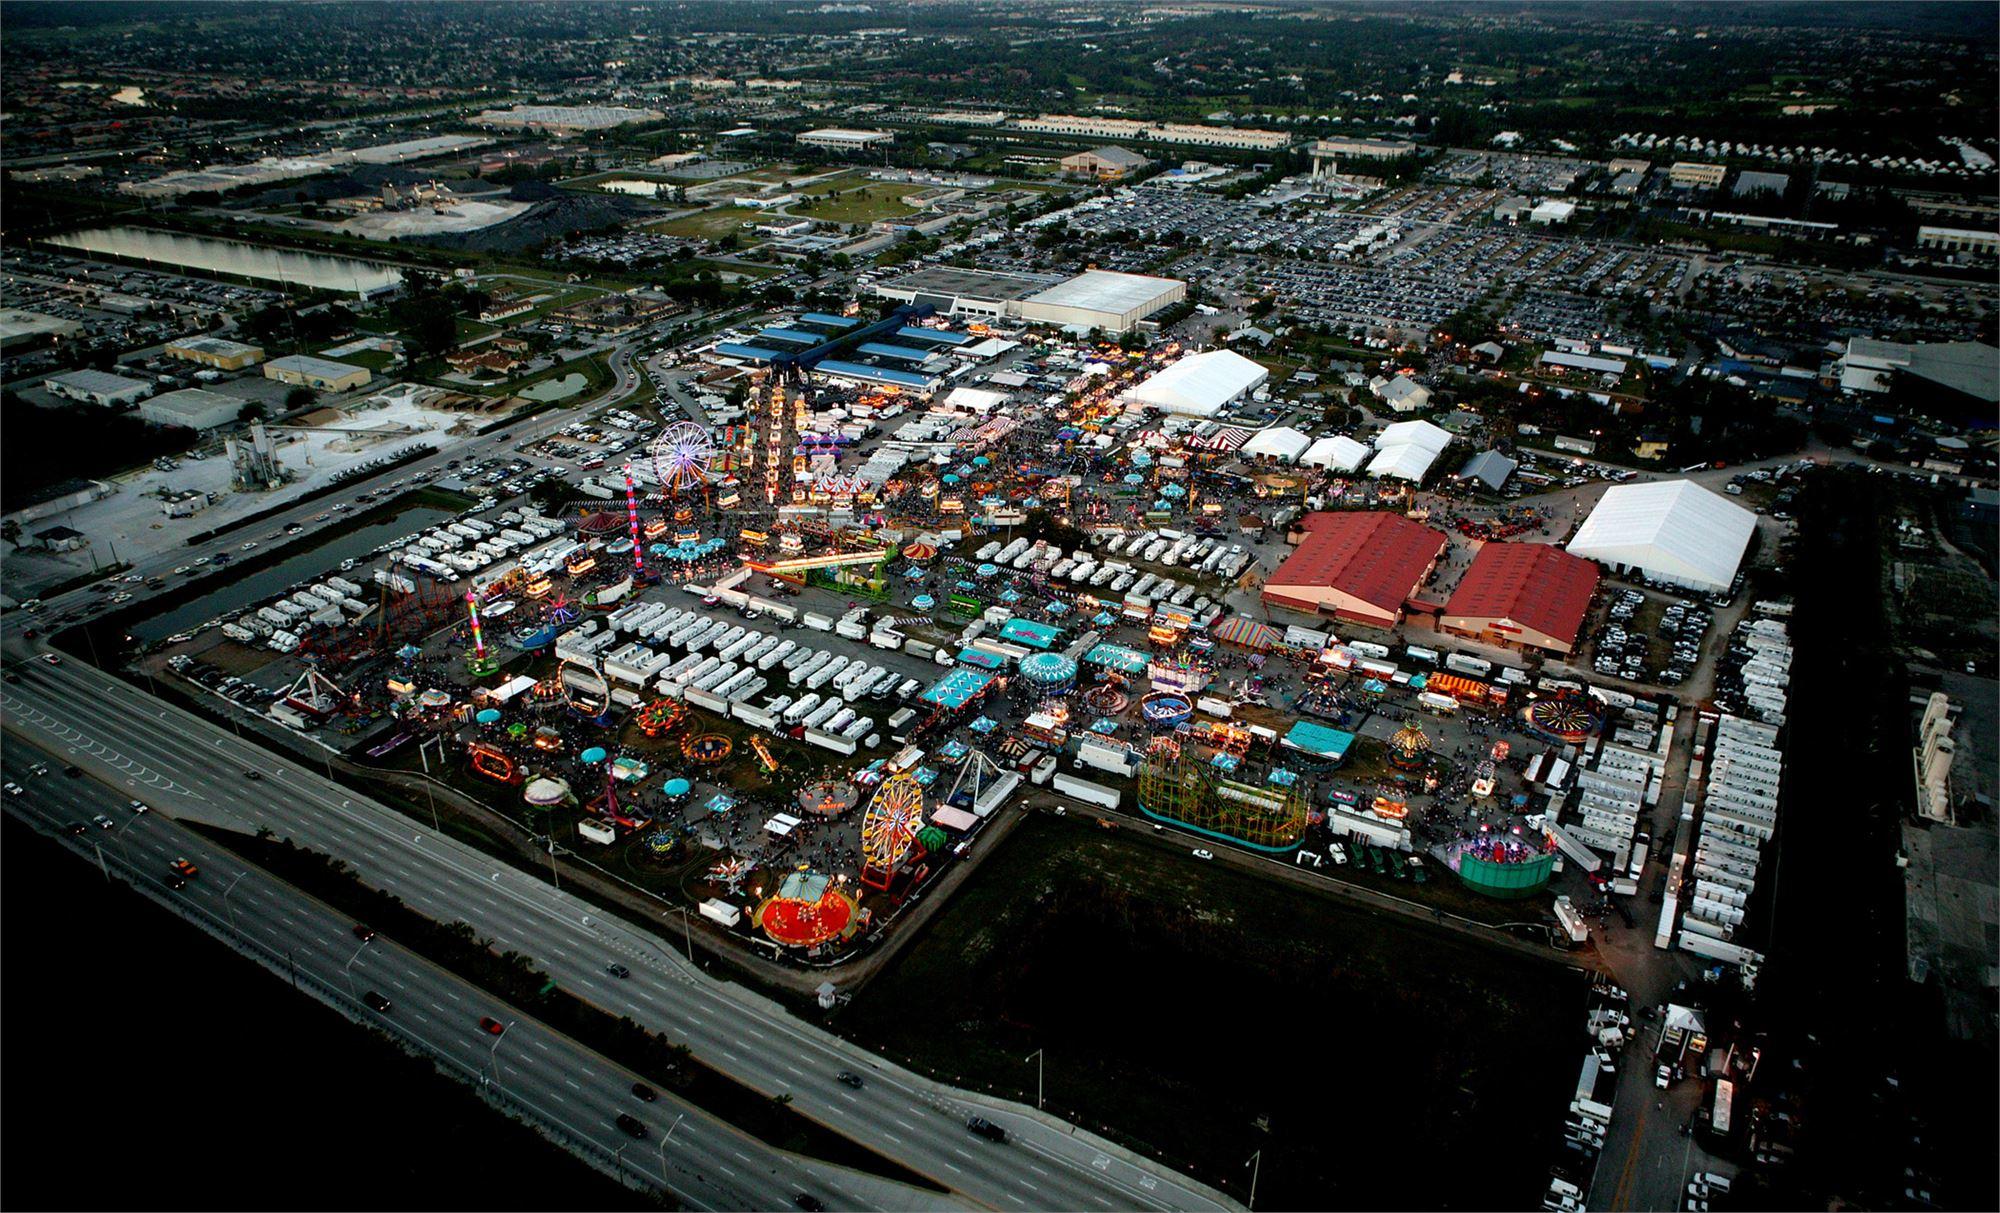 South Florida Fair | West Palm Beach, Fl | 561.793.0333 throughout South Florida Fairgrounds Events Calendar